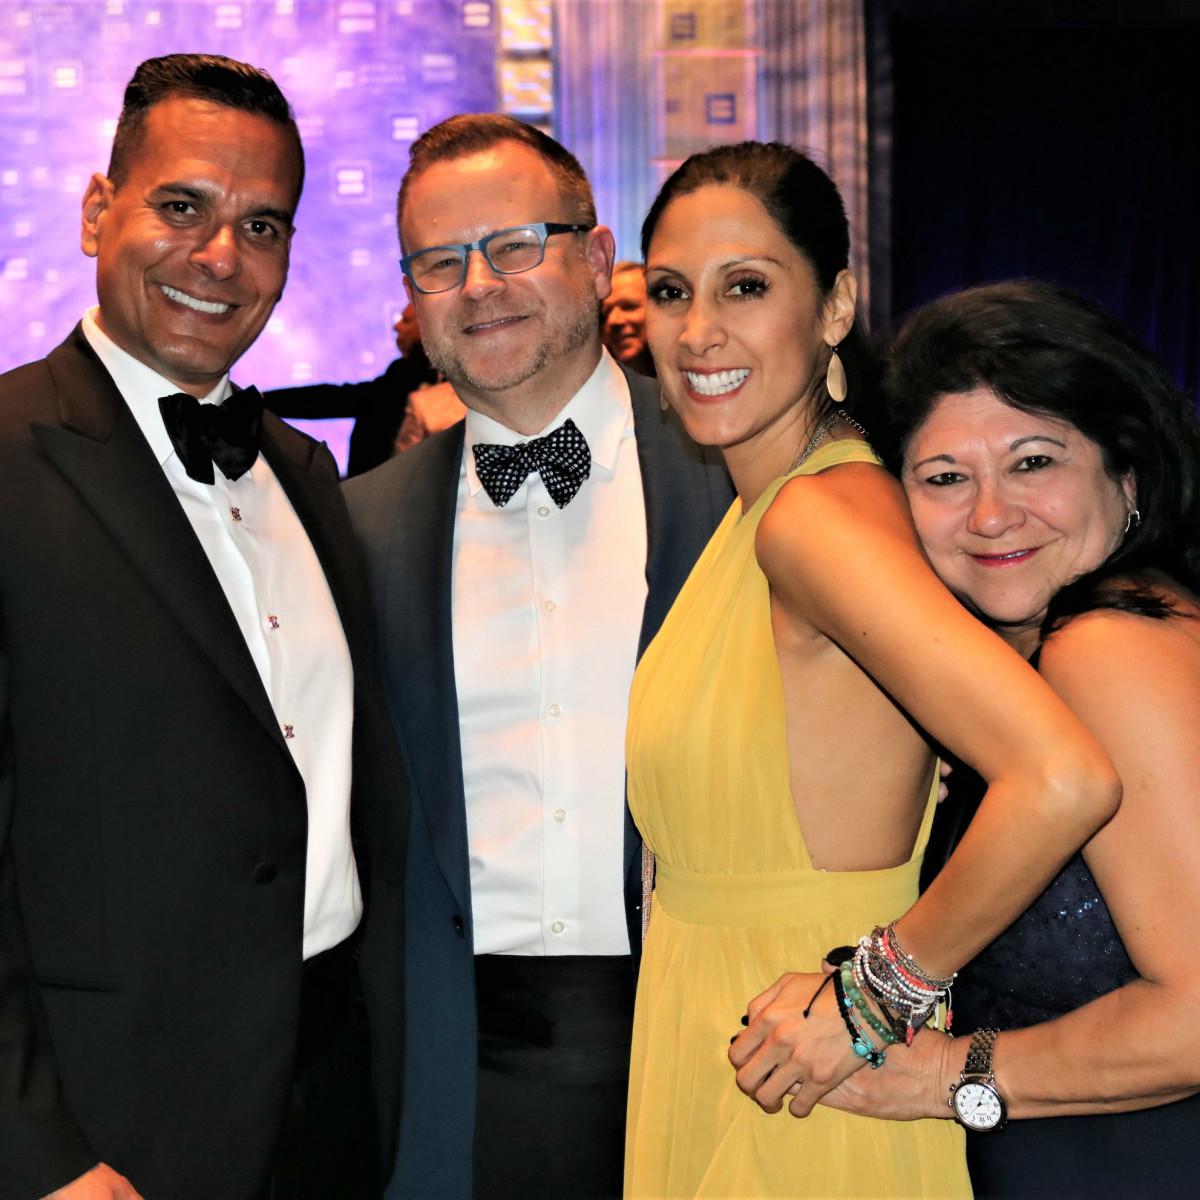 Ricardo Guajardo, Steven Wagner, Andi Chambers, Janie Lopez